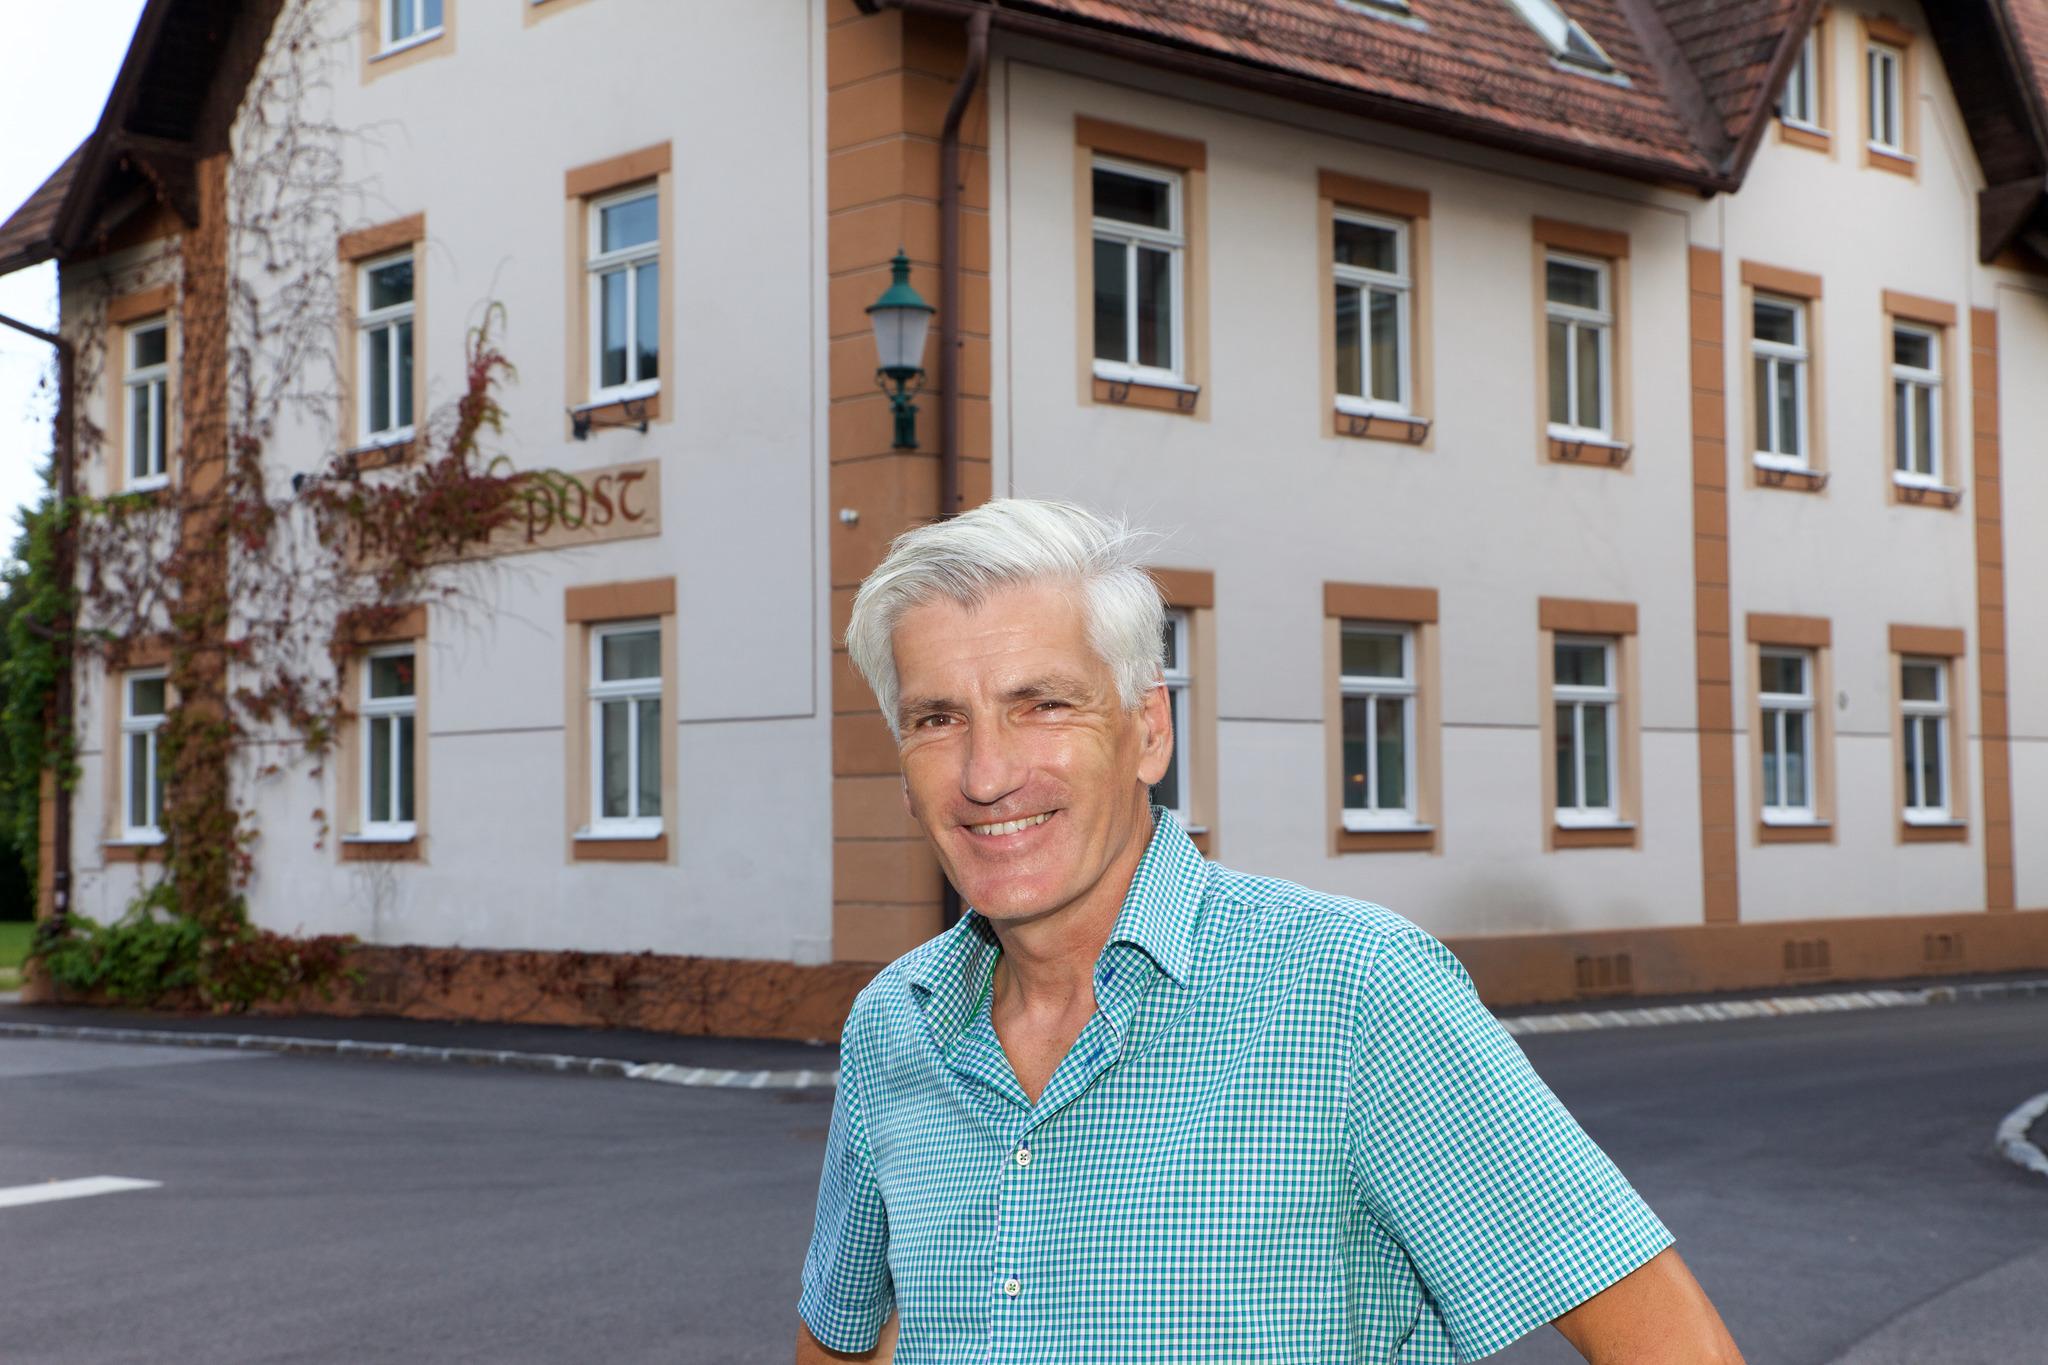 Kirchberg am wechsel single stadt - Sexdating in Heidelberg